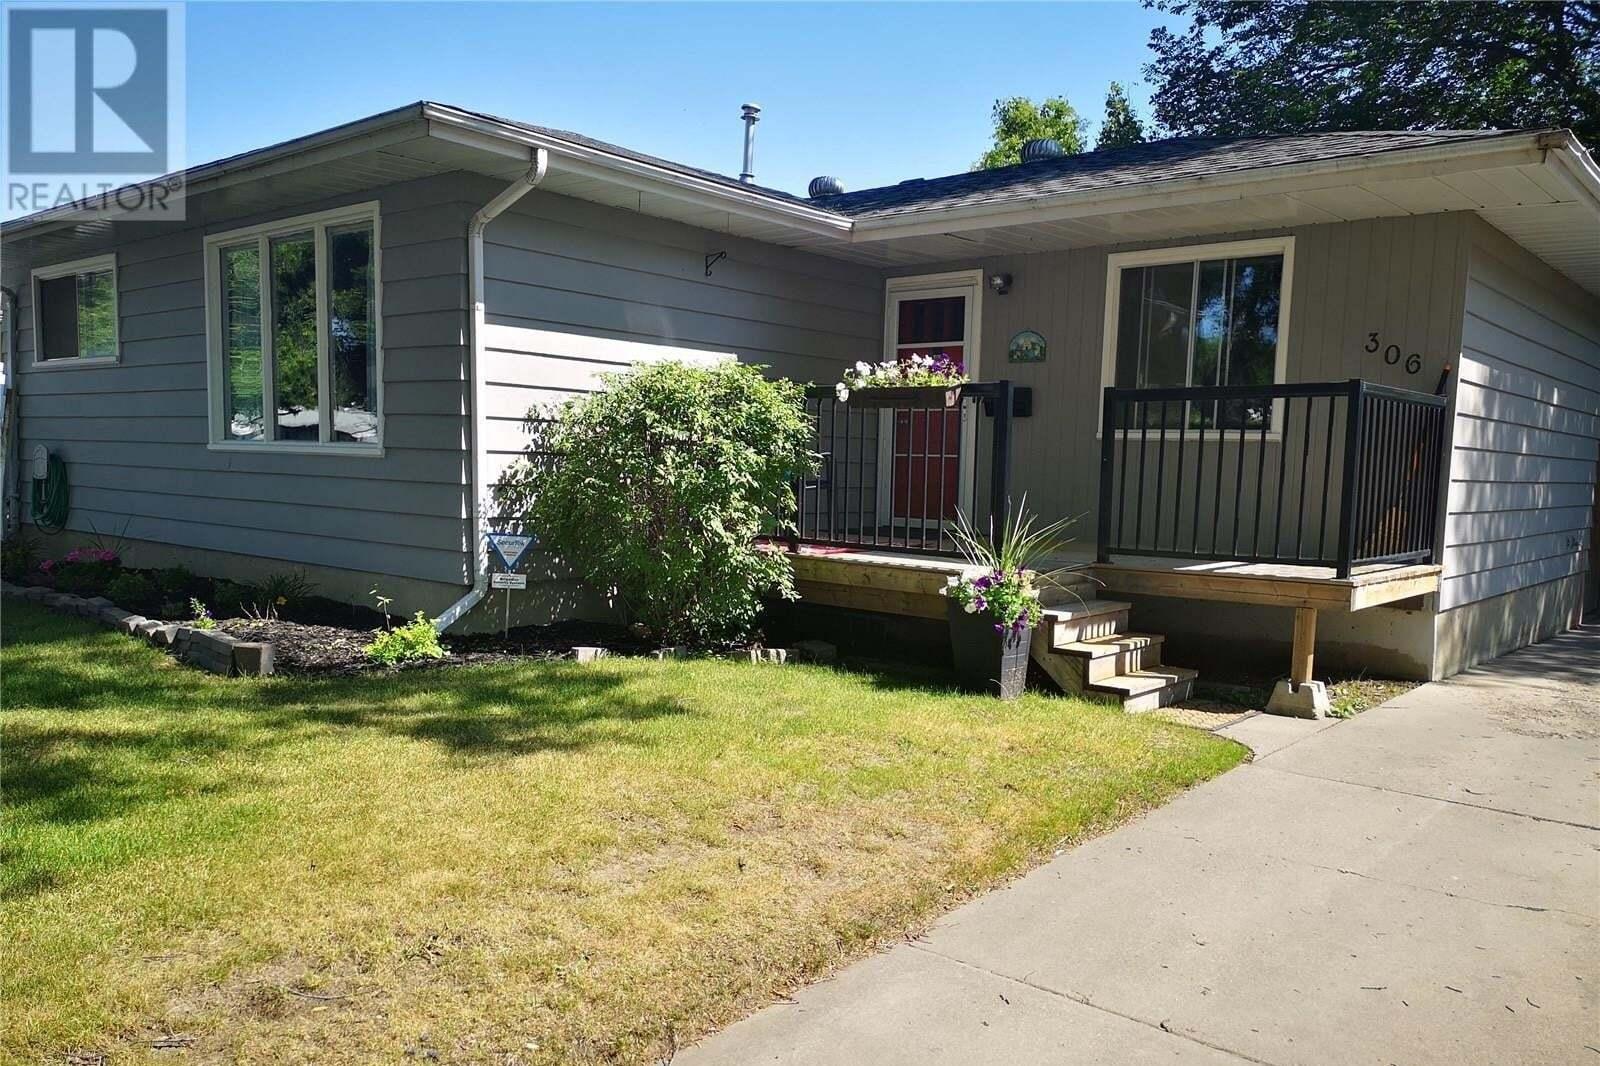 House for sale at 306 Witney Ave N Saskatoon Saskatchewan - MLS: SK821733